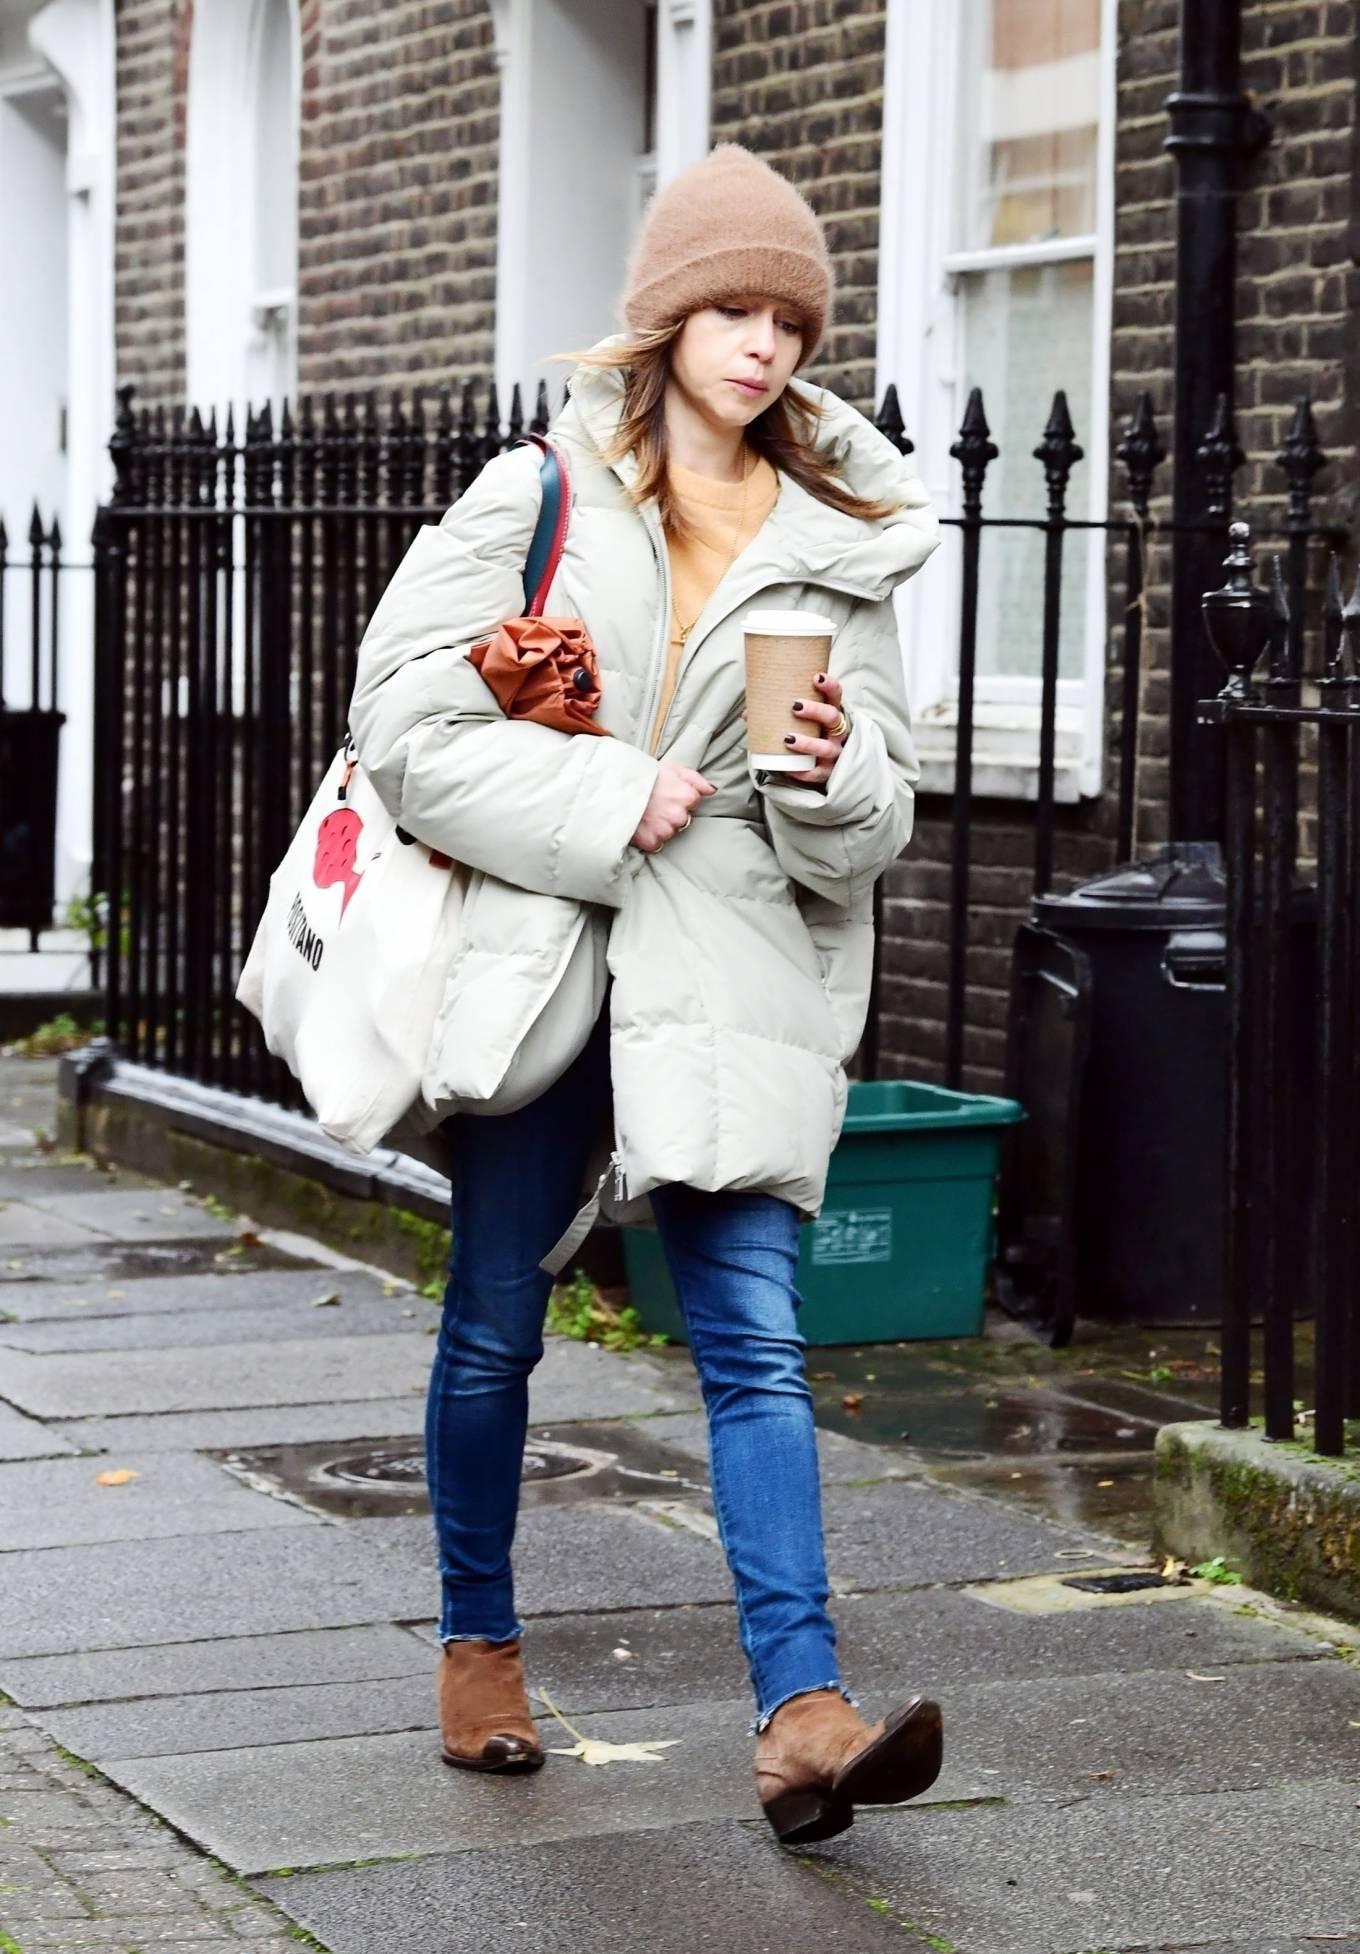 Emilia Clarke 2020 : Emilia Clarke – Out in London-09